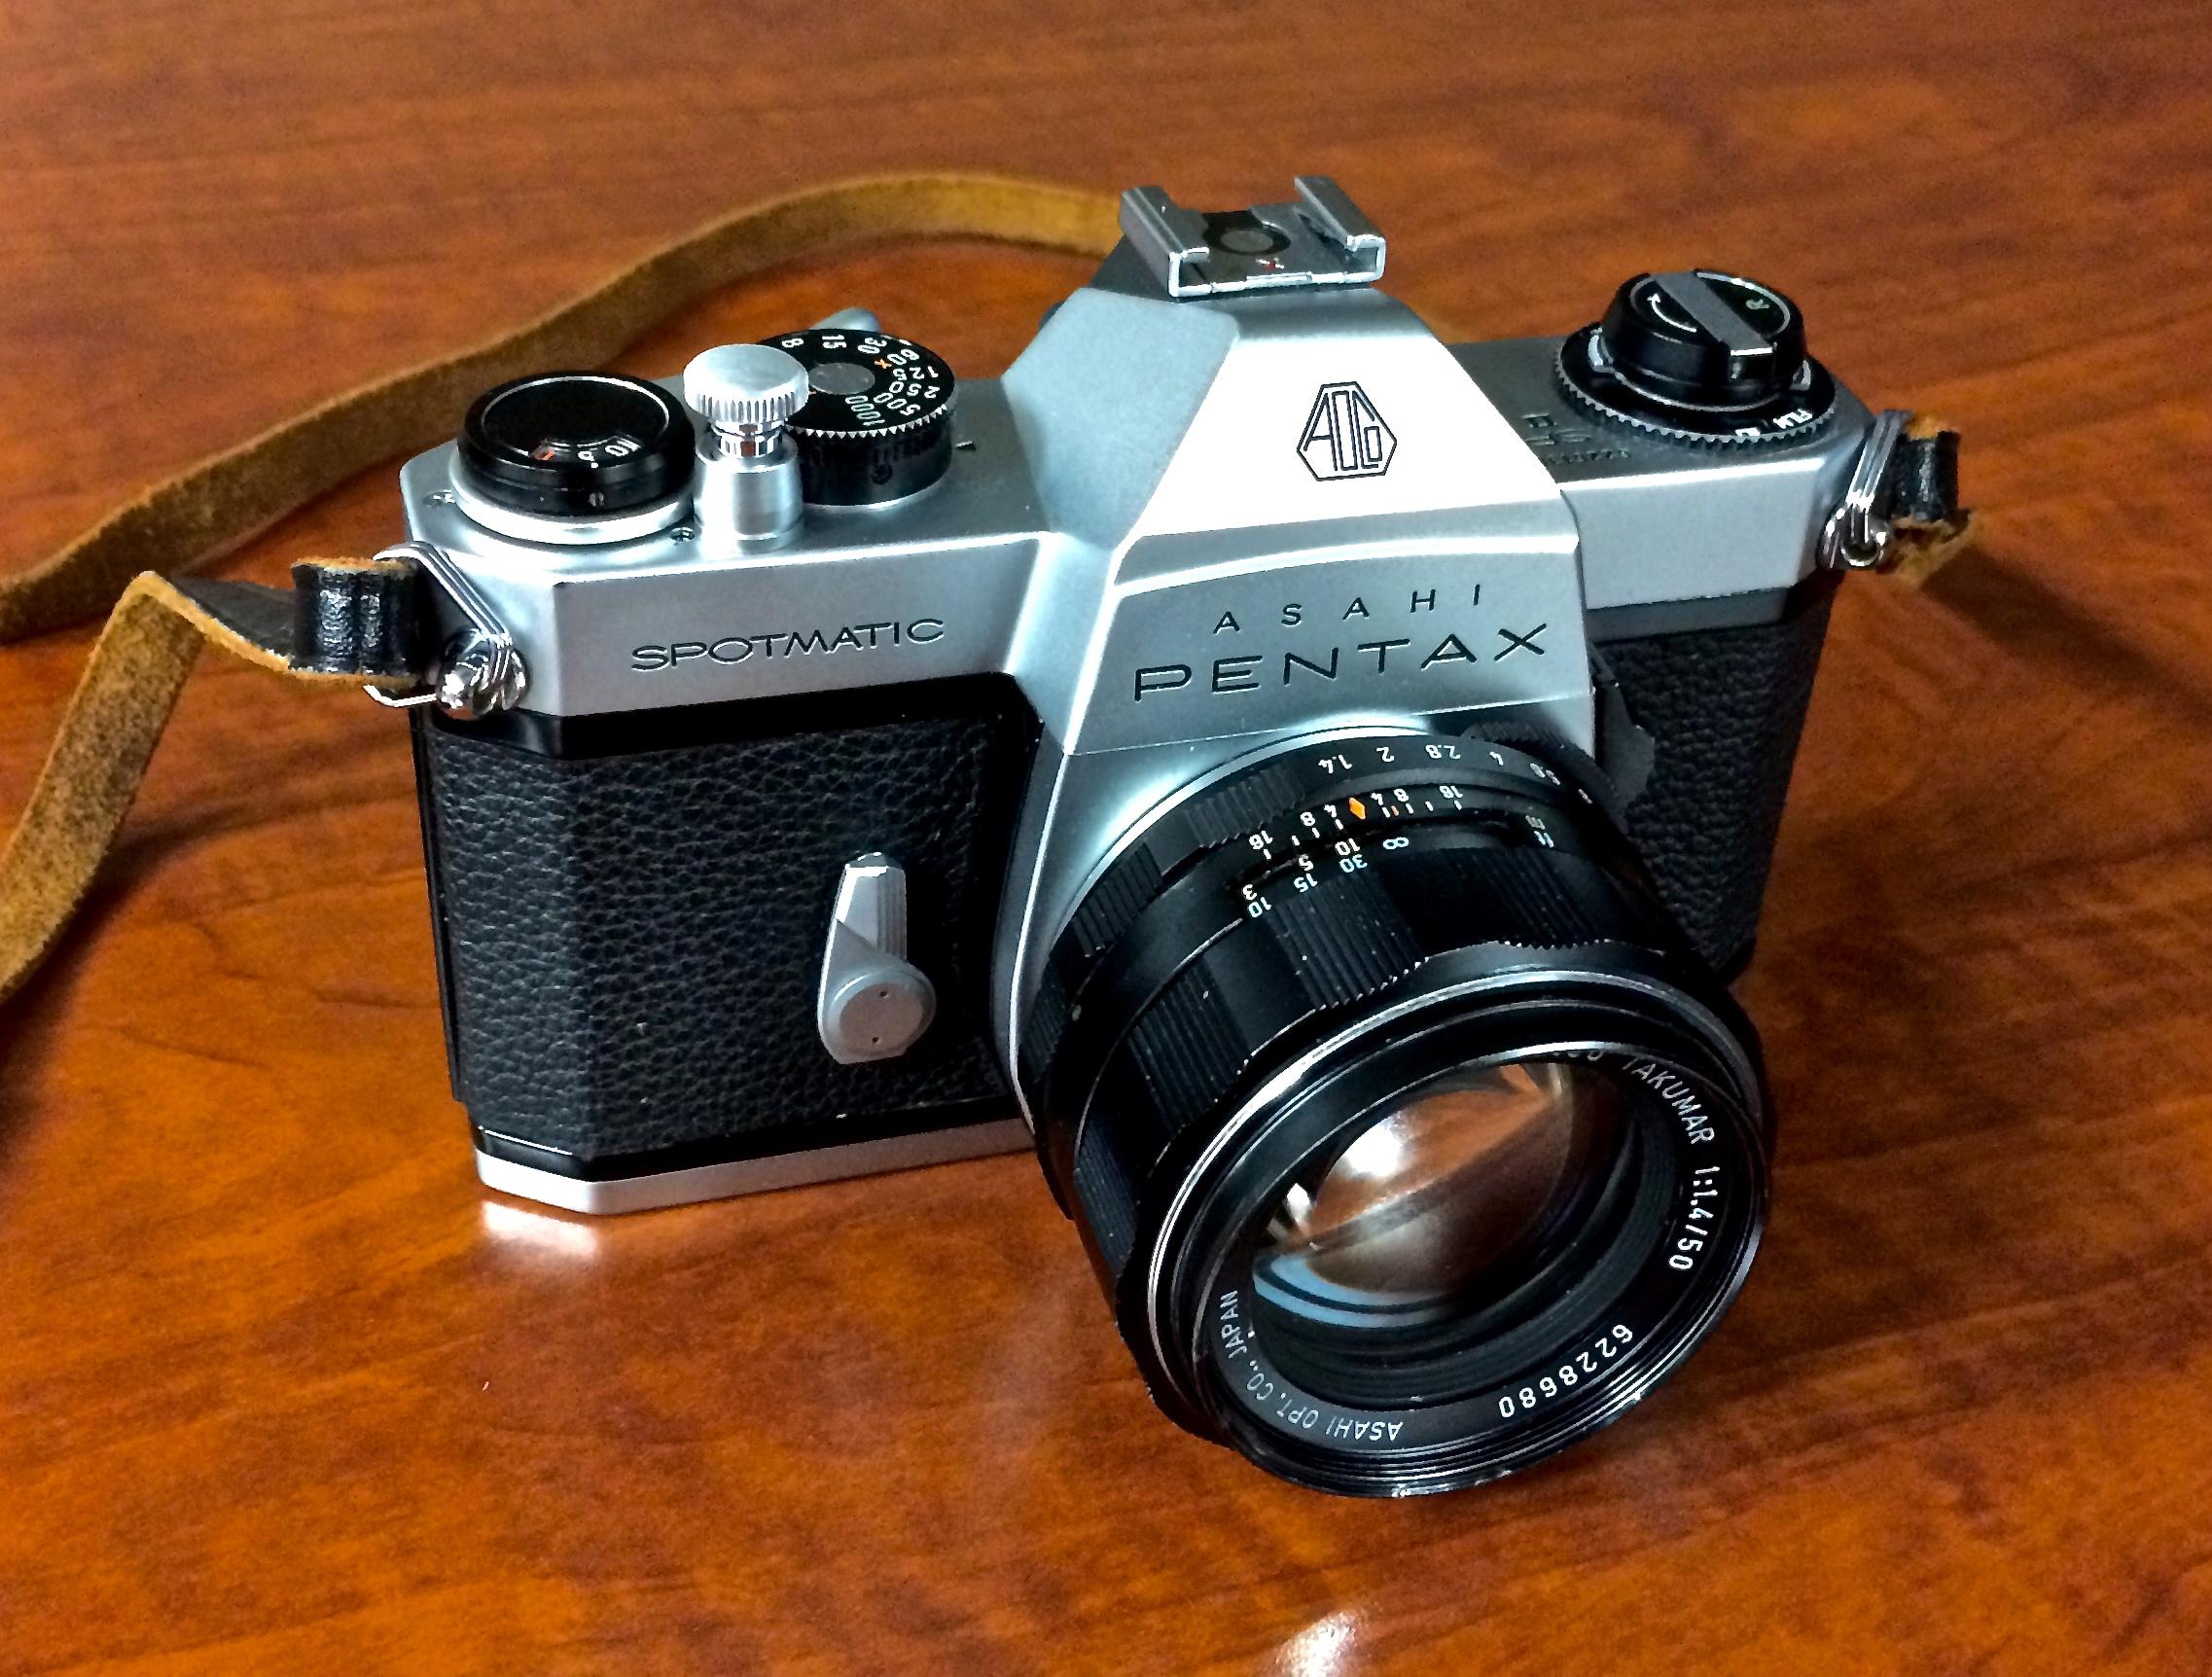 Pentax Spotmatic SPII with 50mm f/1.4 Super Multi-Coated Takumar